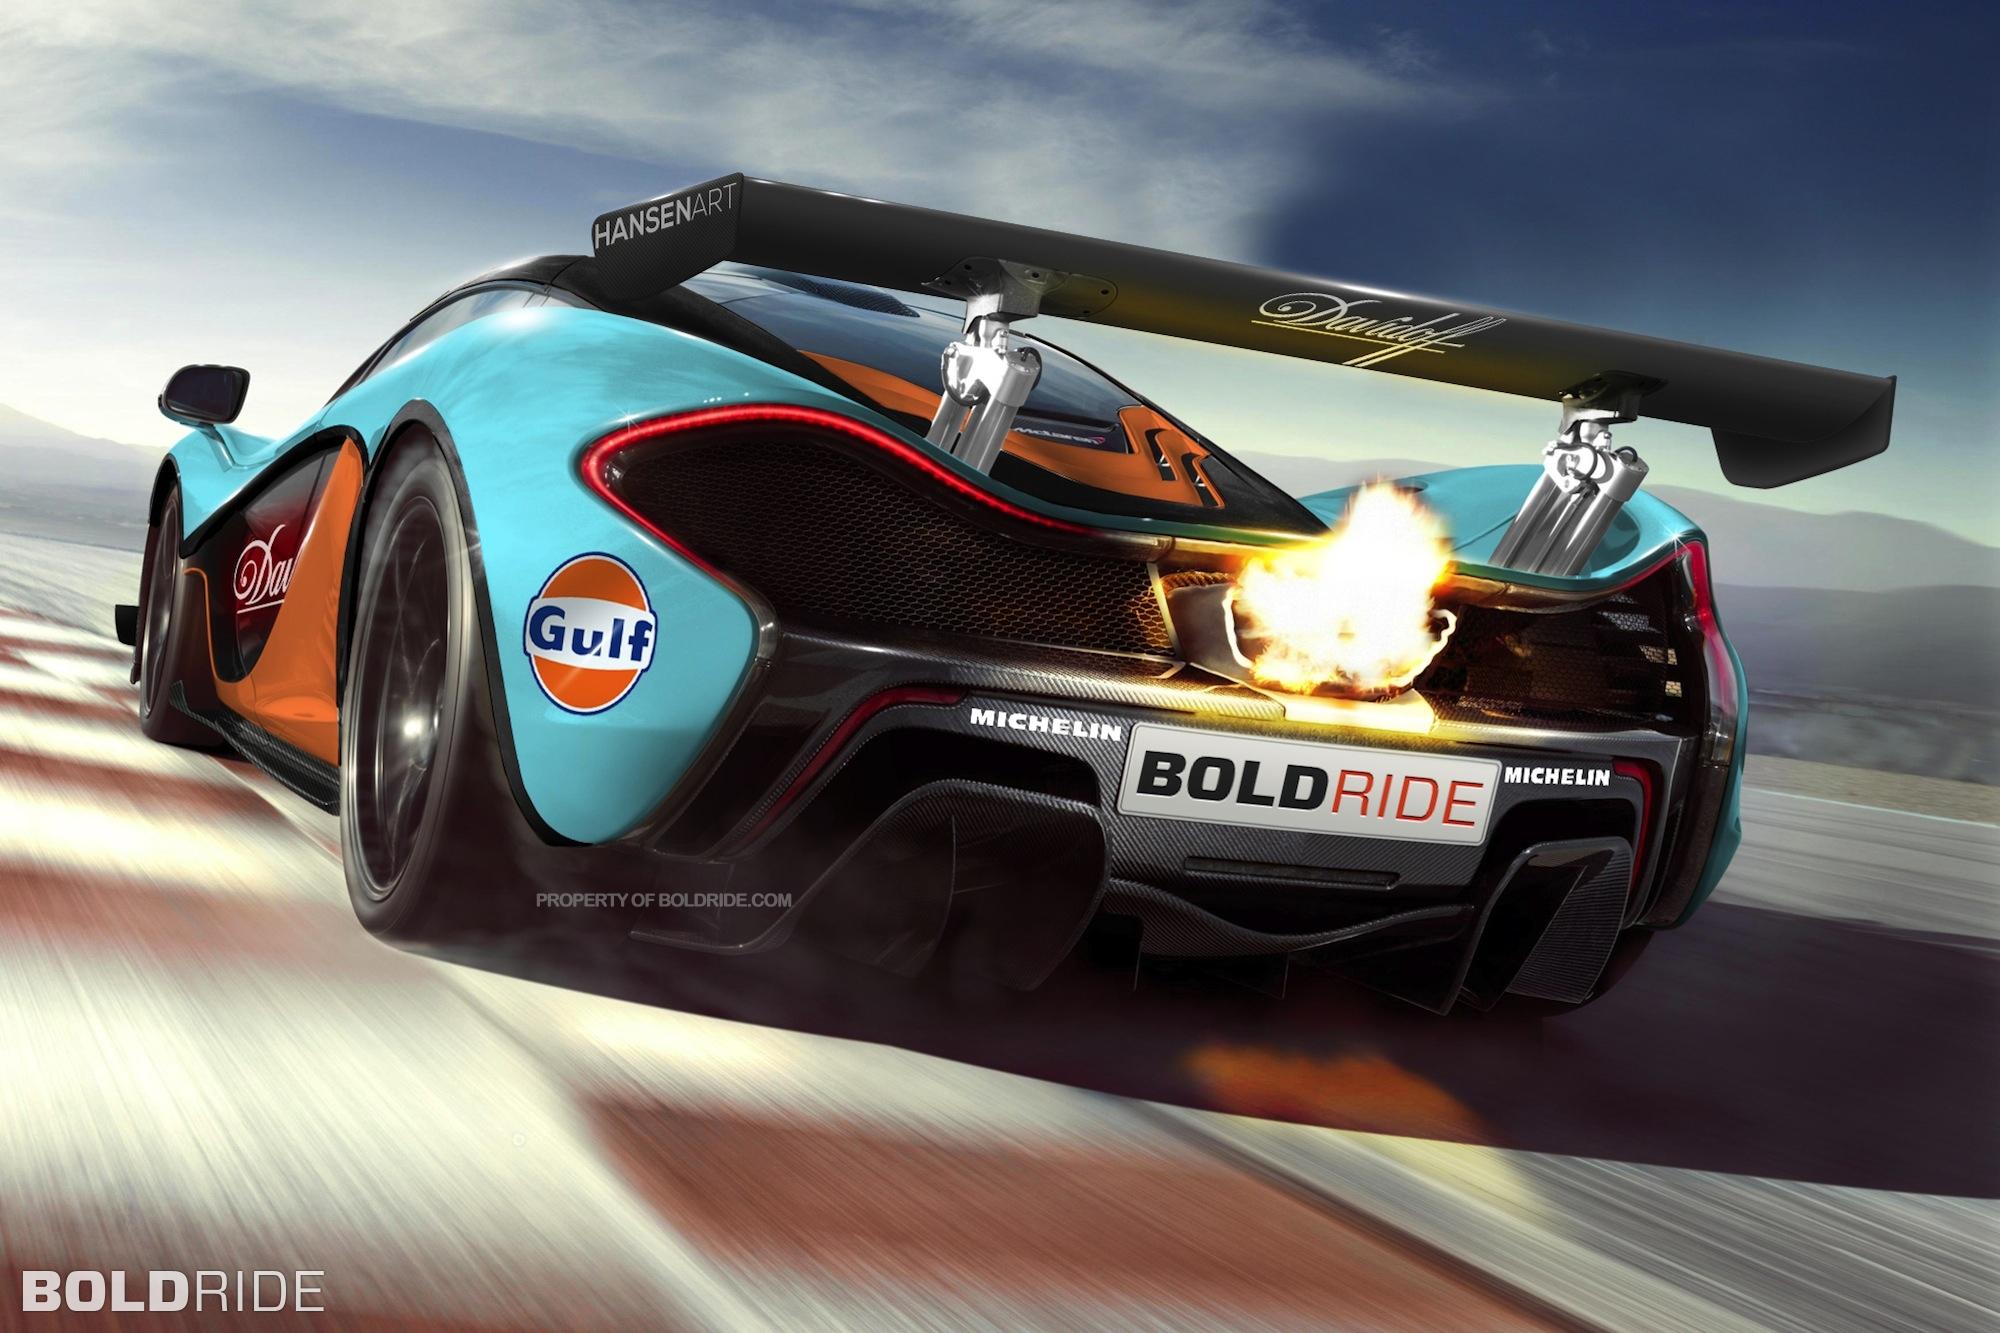 http://images.caradisiac.com/images/5/4/3/9/85439/S0-McLaren-P1-GTR-Gulf-vs-LaFerrari-EVOXX-dans-vos-reves-289155.jpg